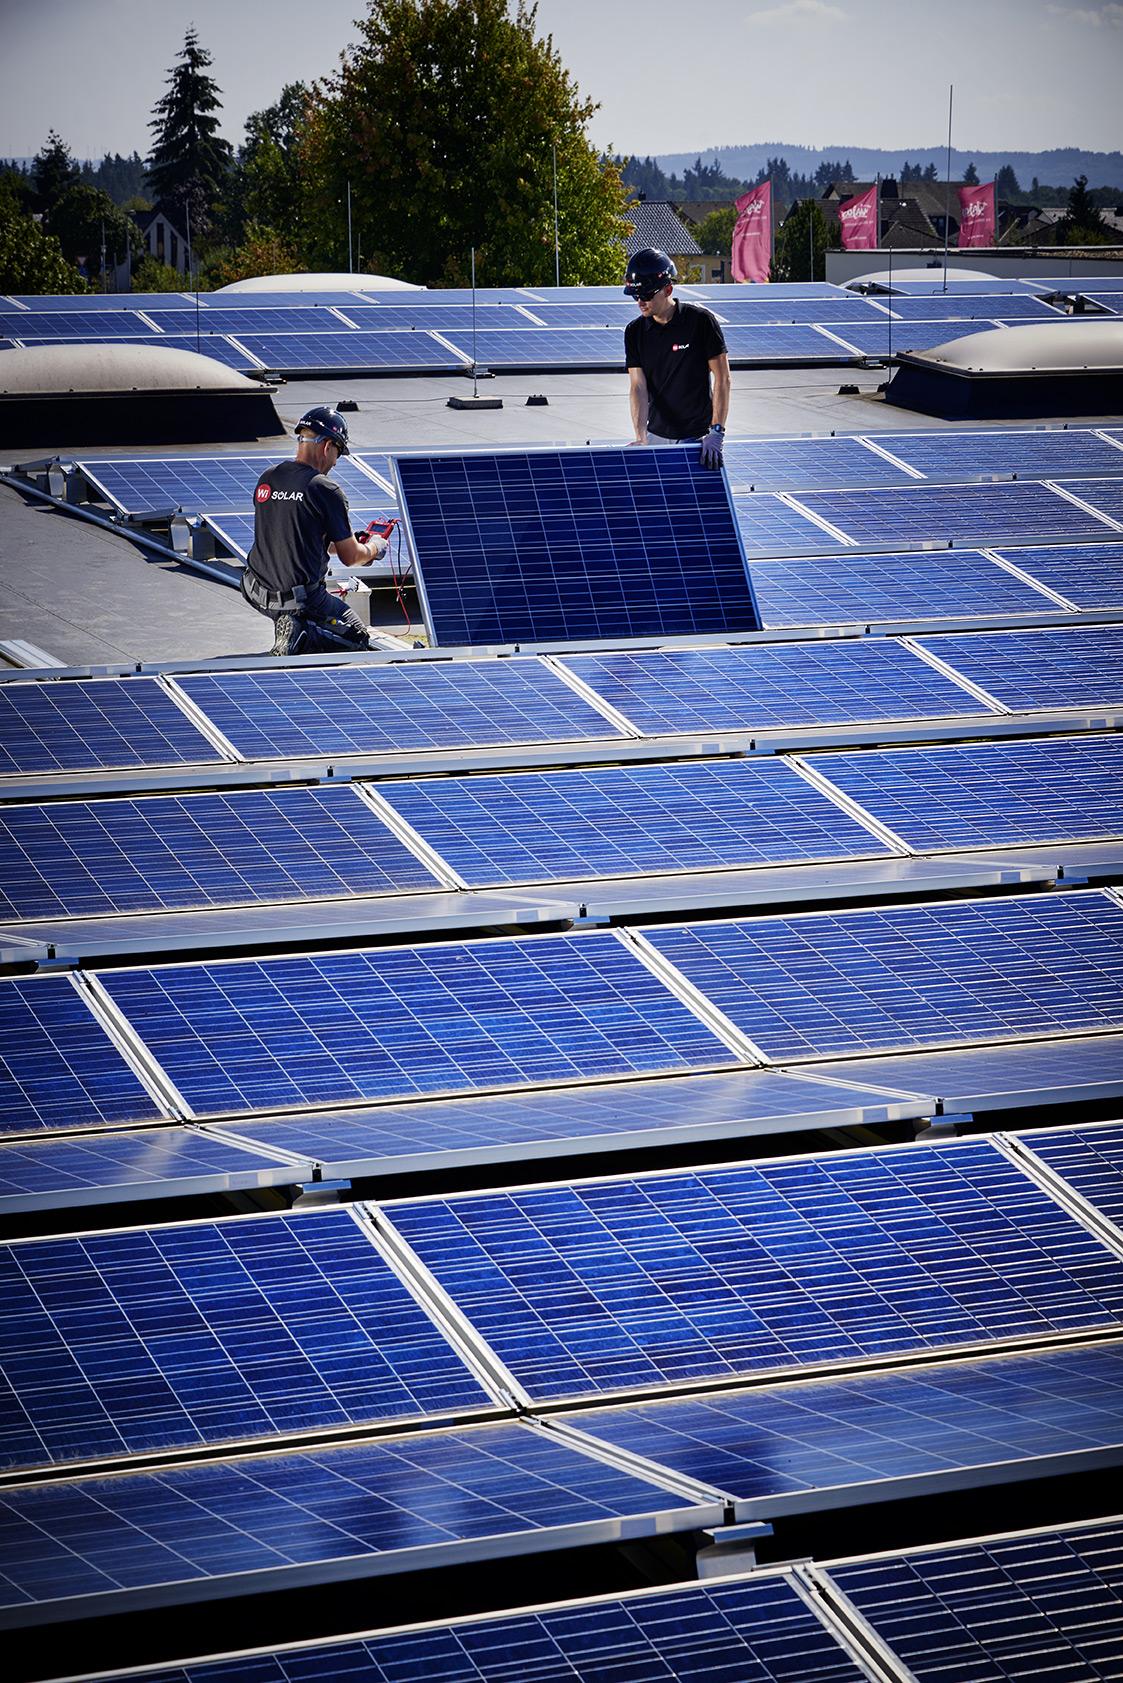 wajos-ref-wi_solar_07_09_16_kaisersesch_blankenrath__dsc4181_v2